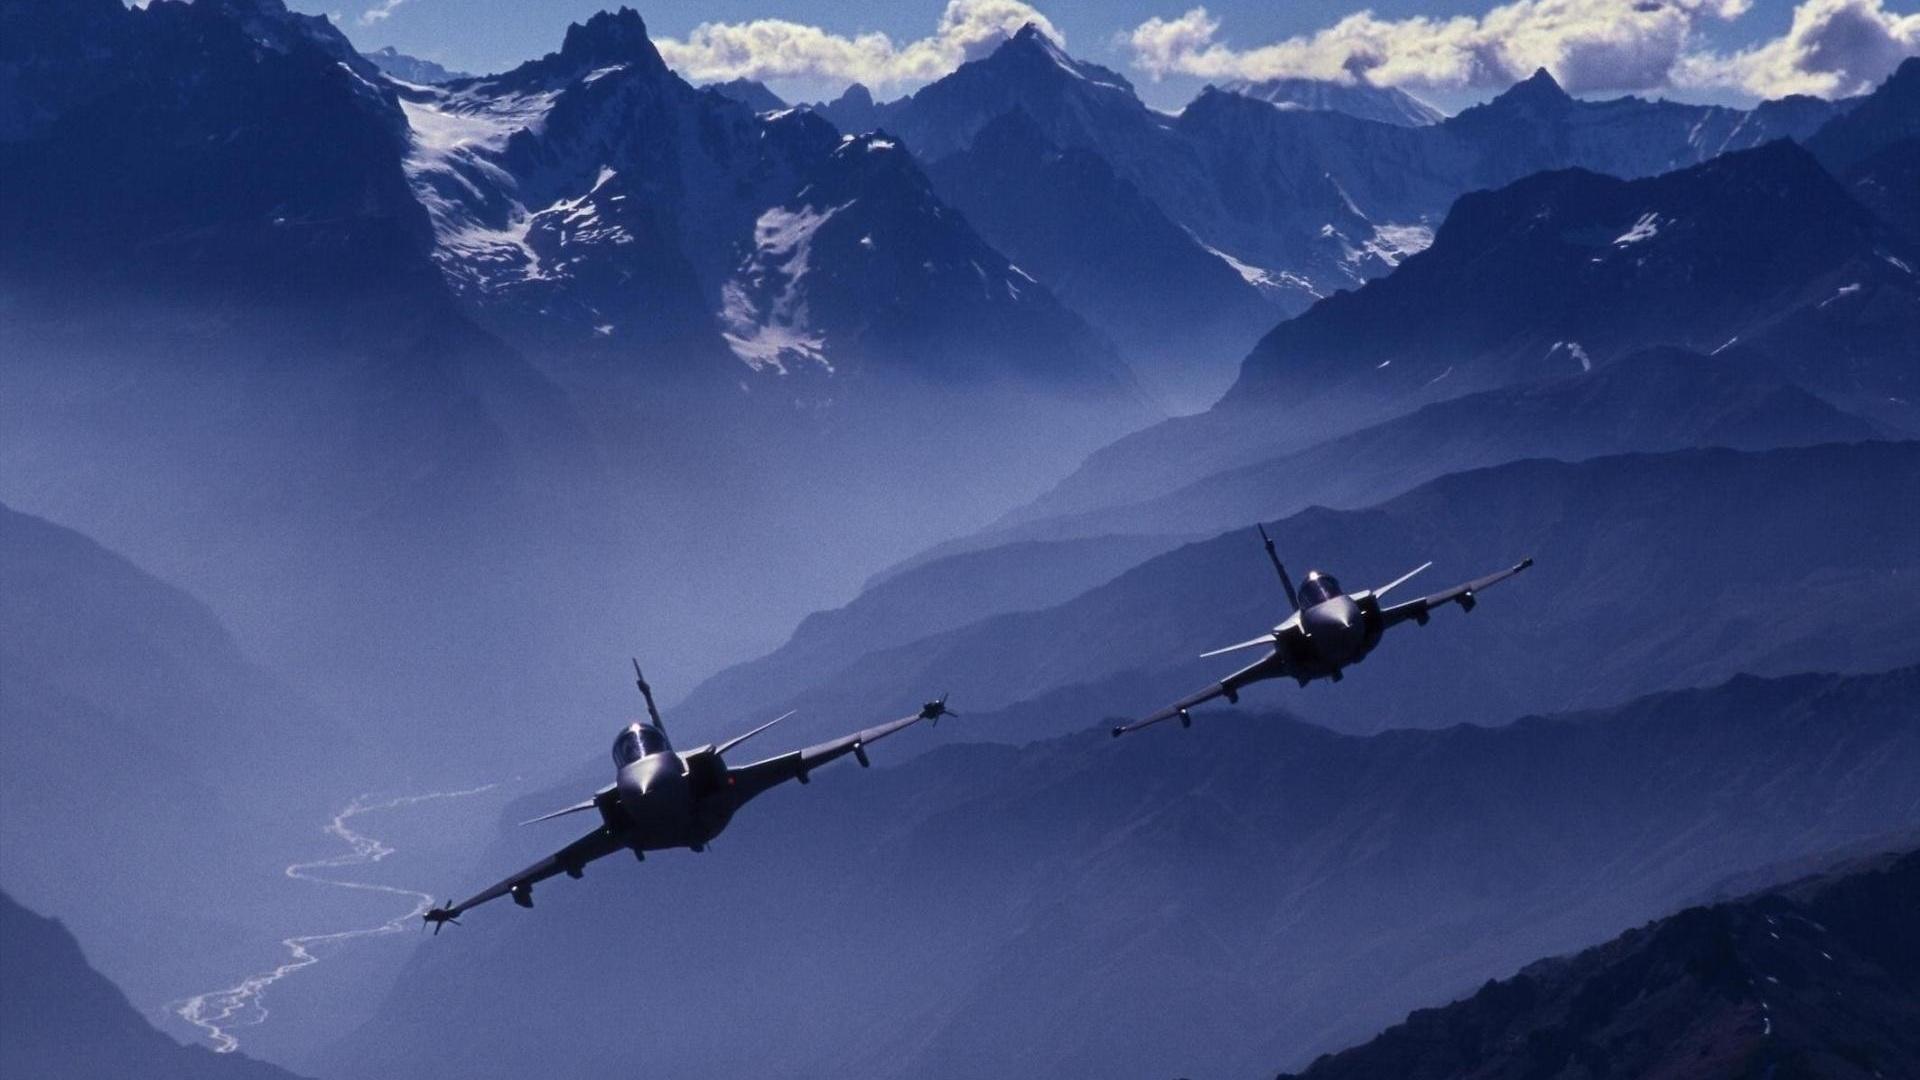 фото боевых самолетов над горами мчс сочи